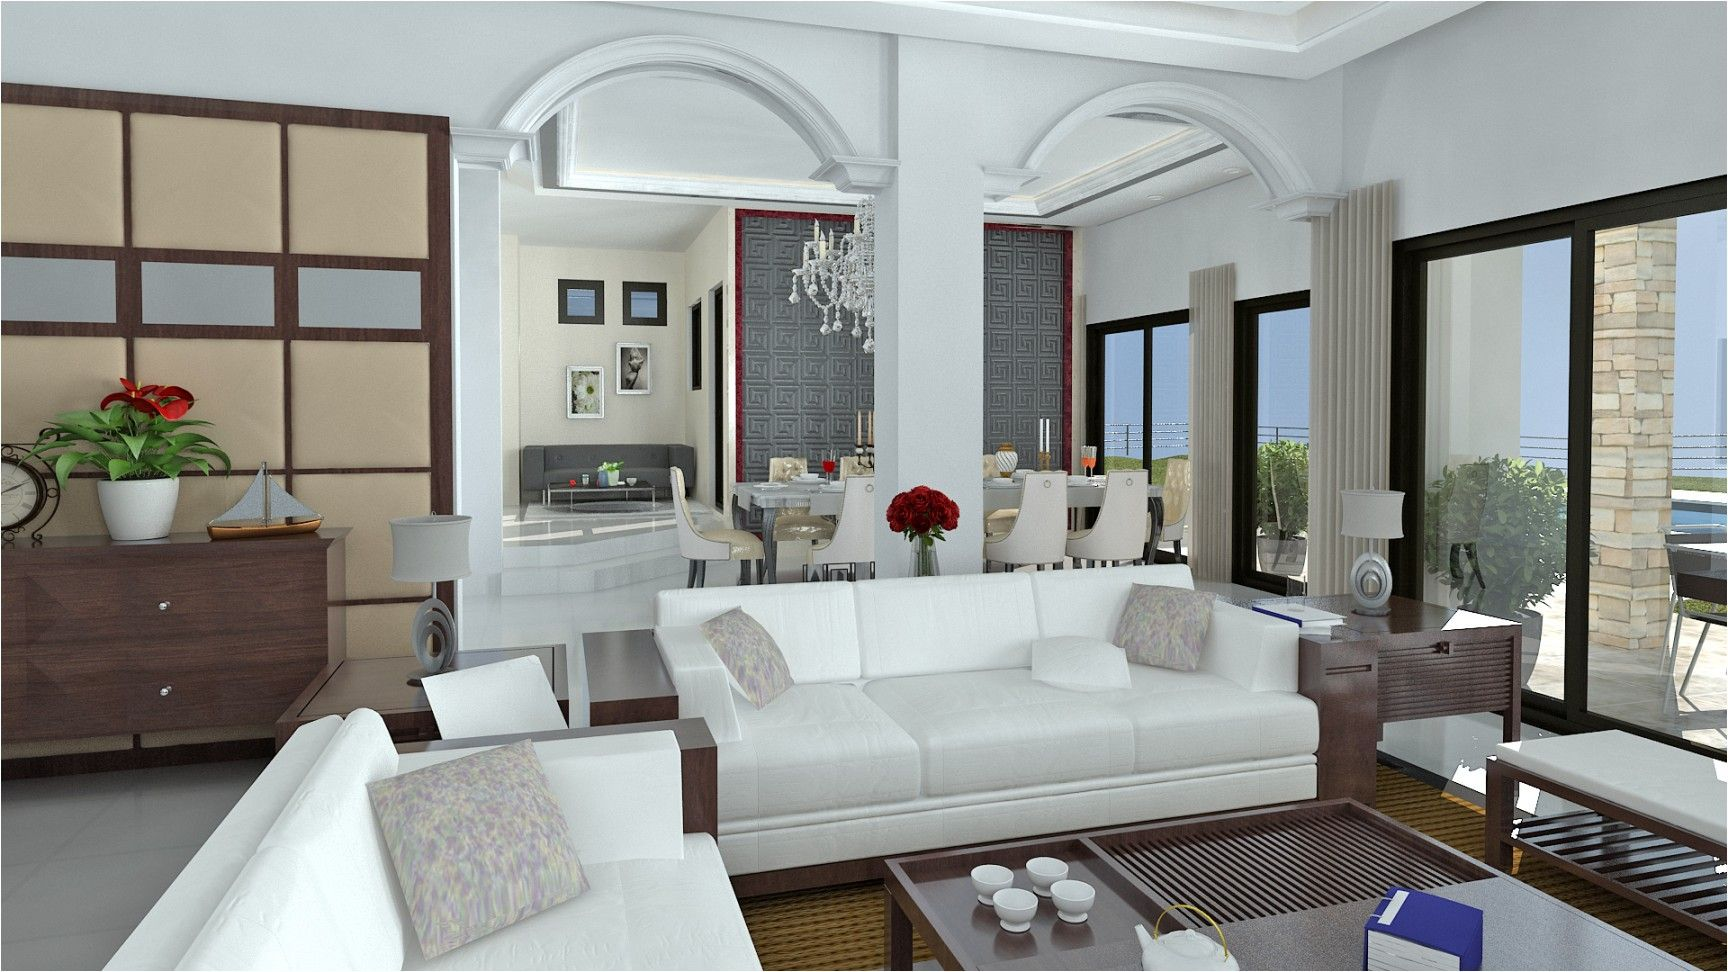 New Ikea Living Room Planner Online Interior design